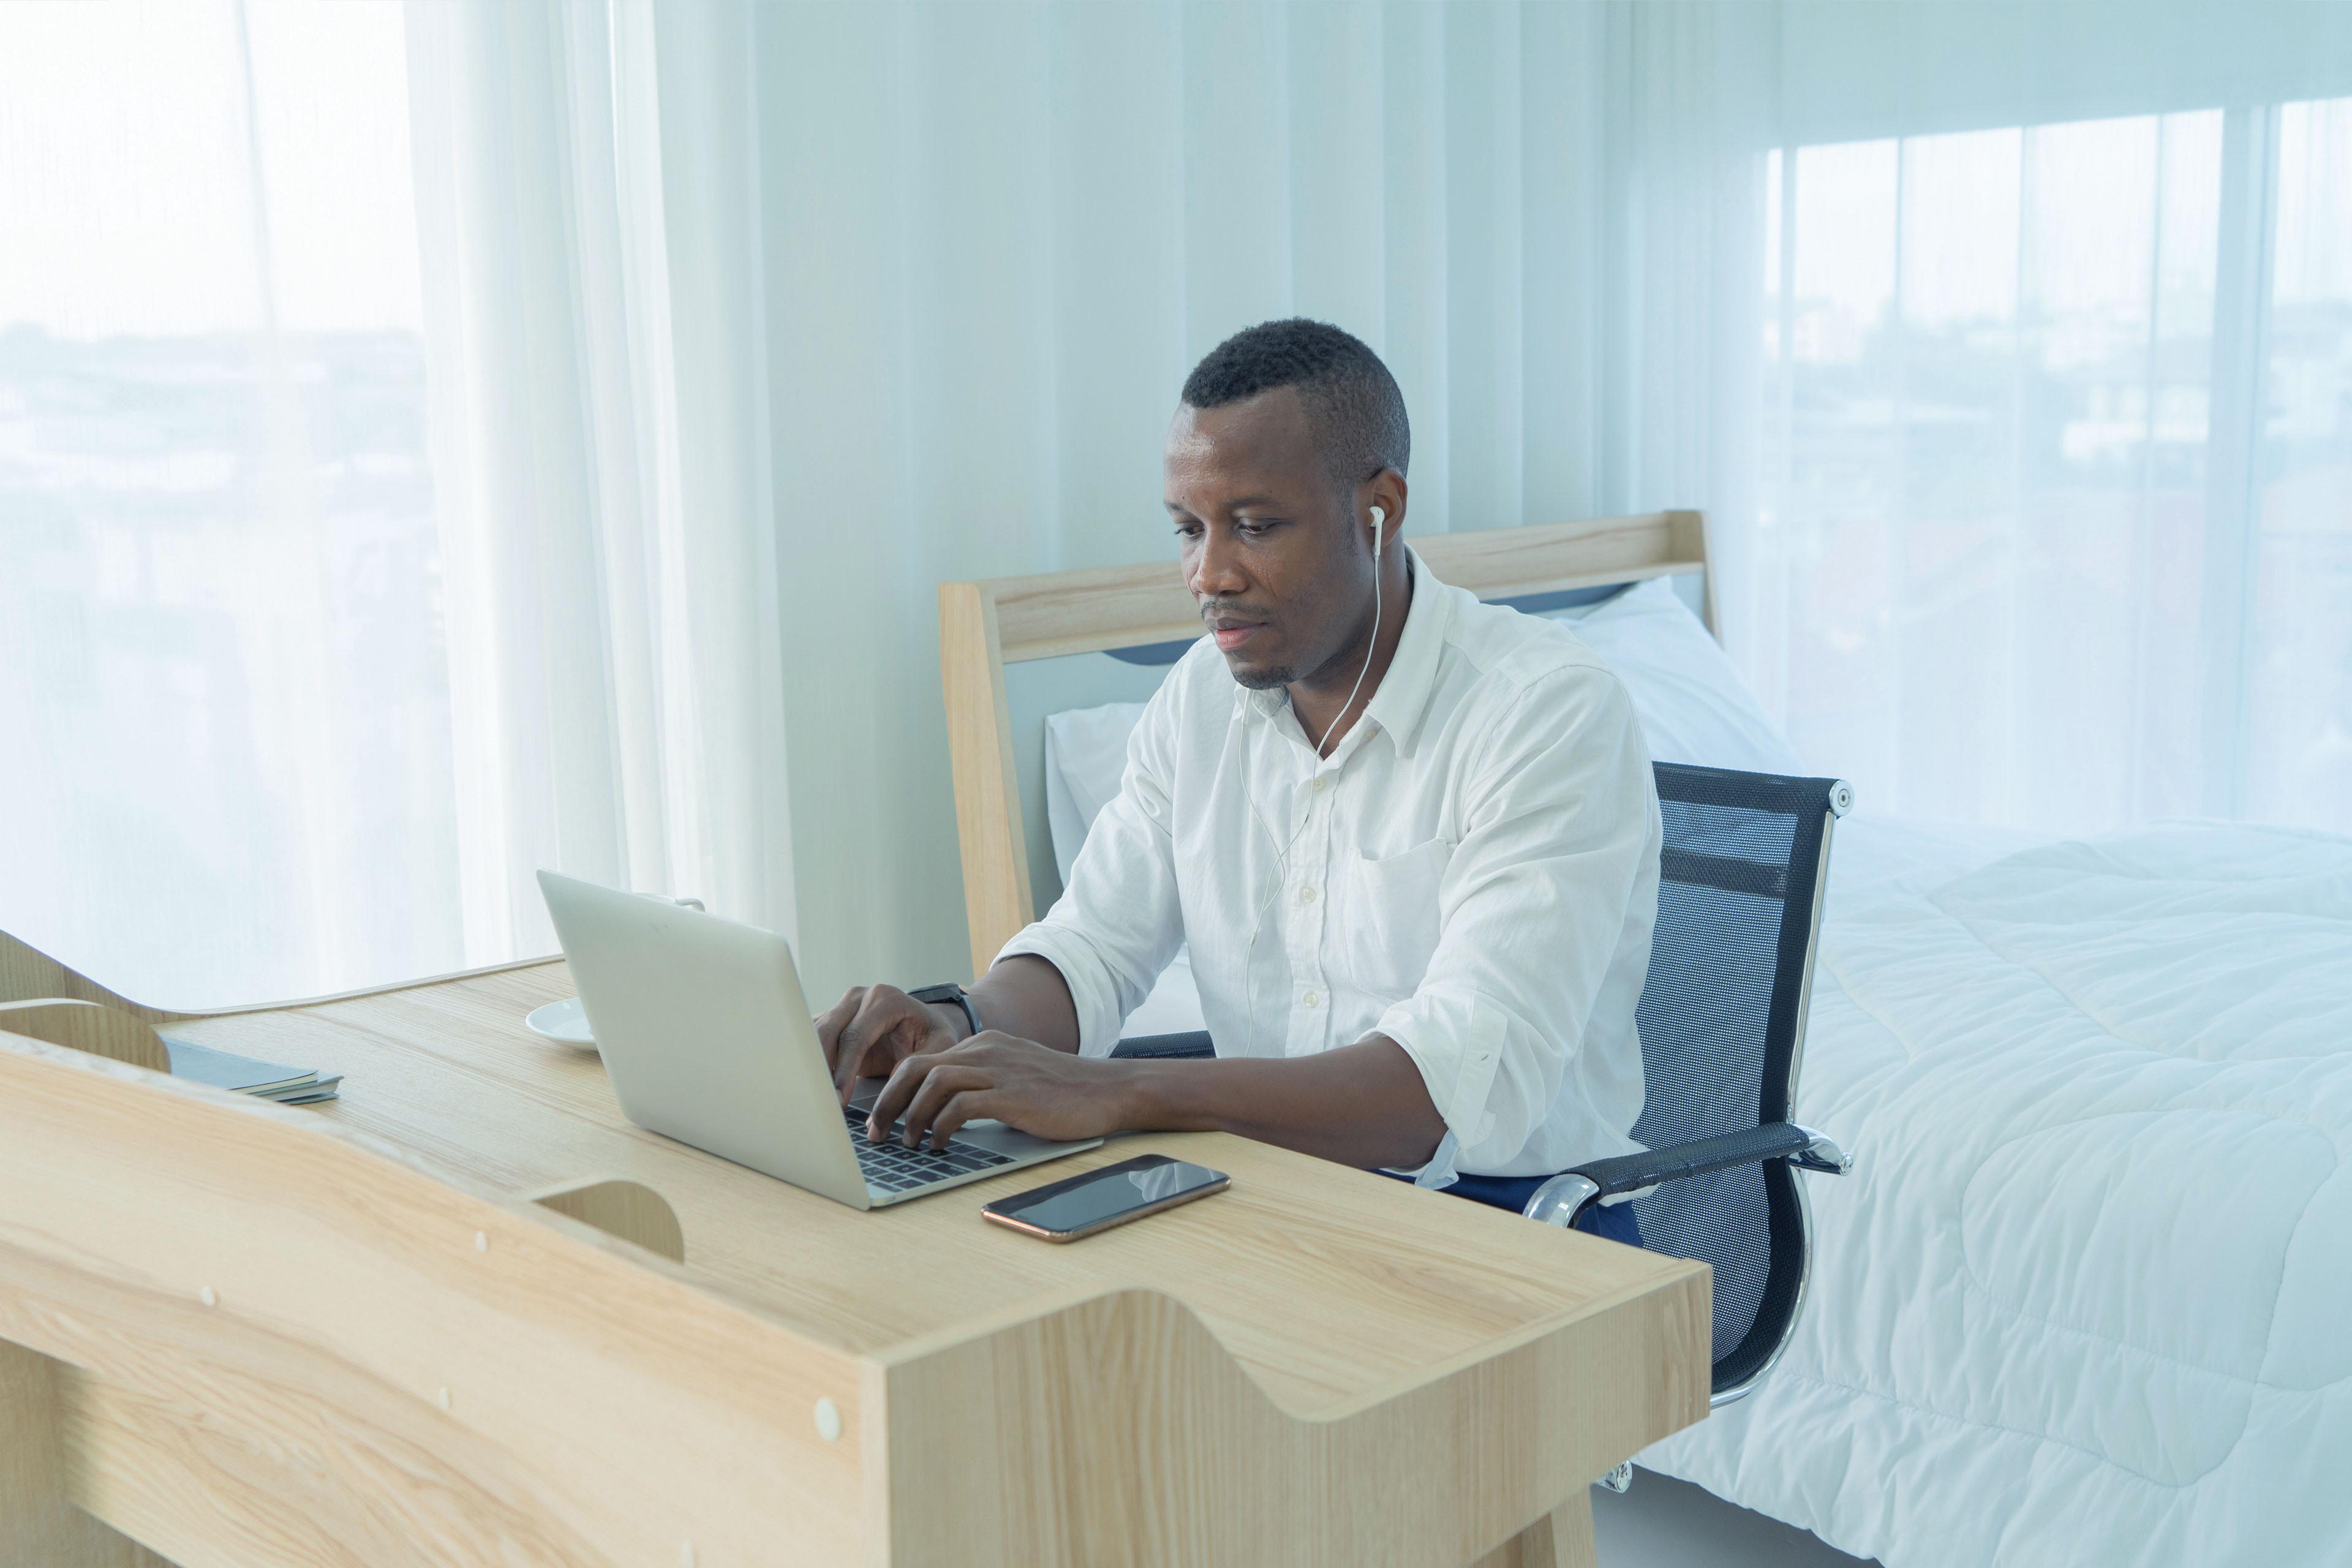 Man working using earphones with computer notebook laptop